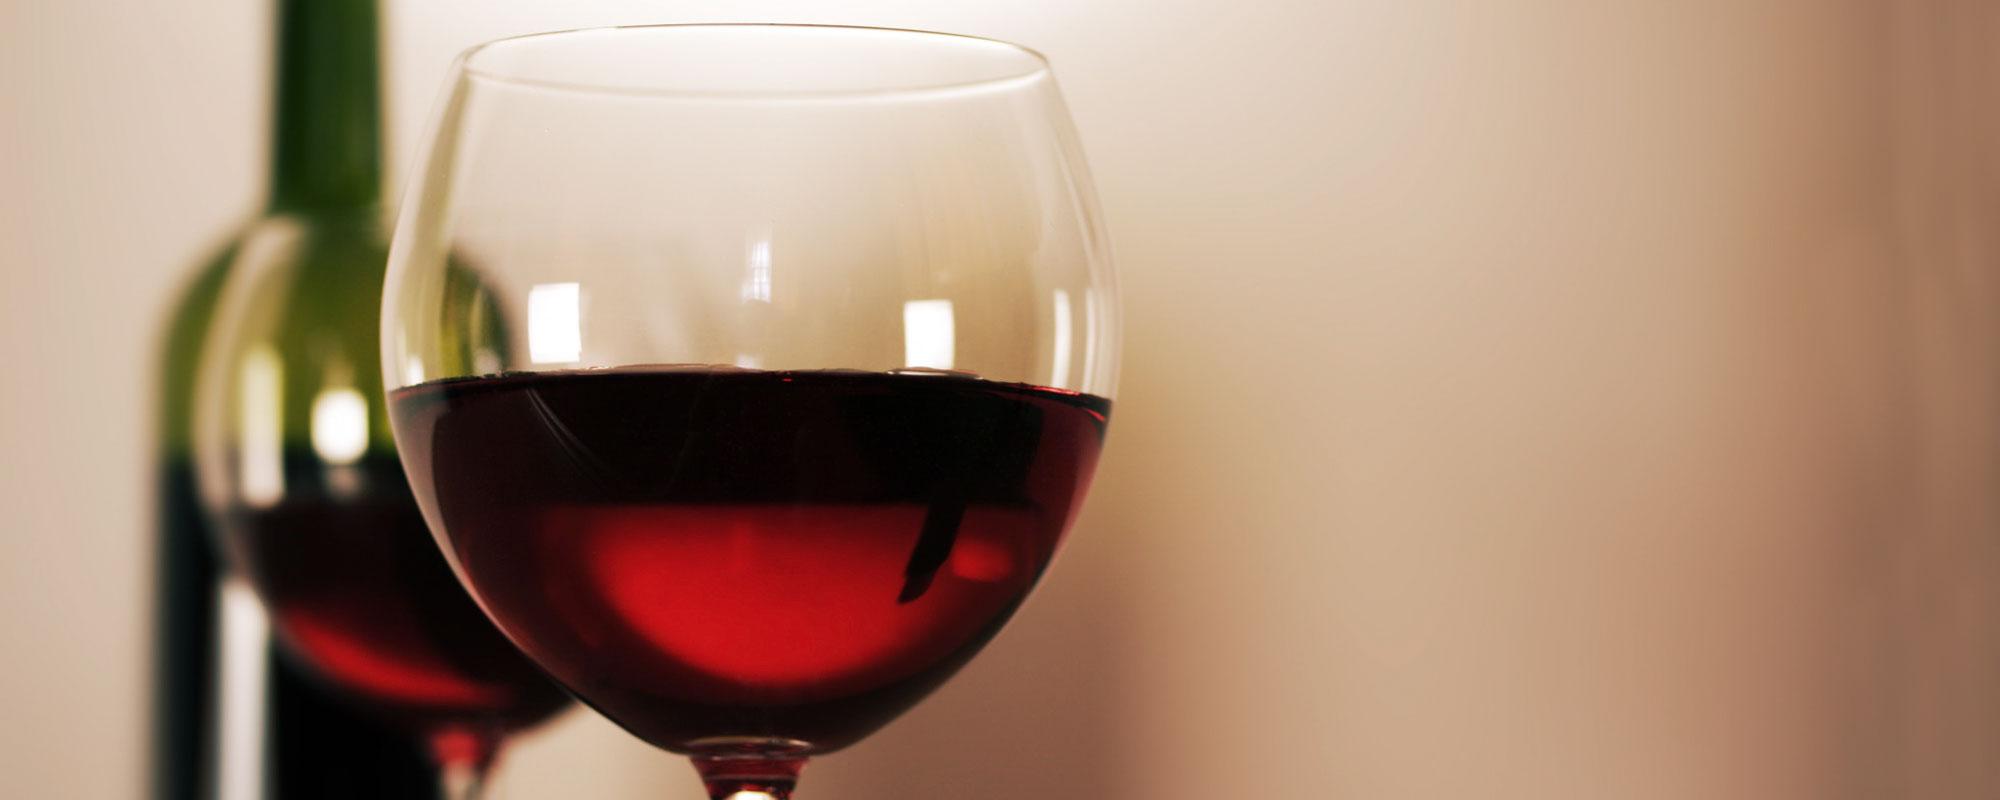 Piemonte vino